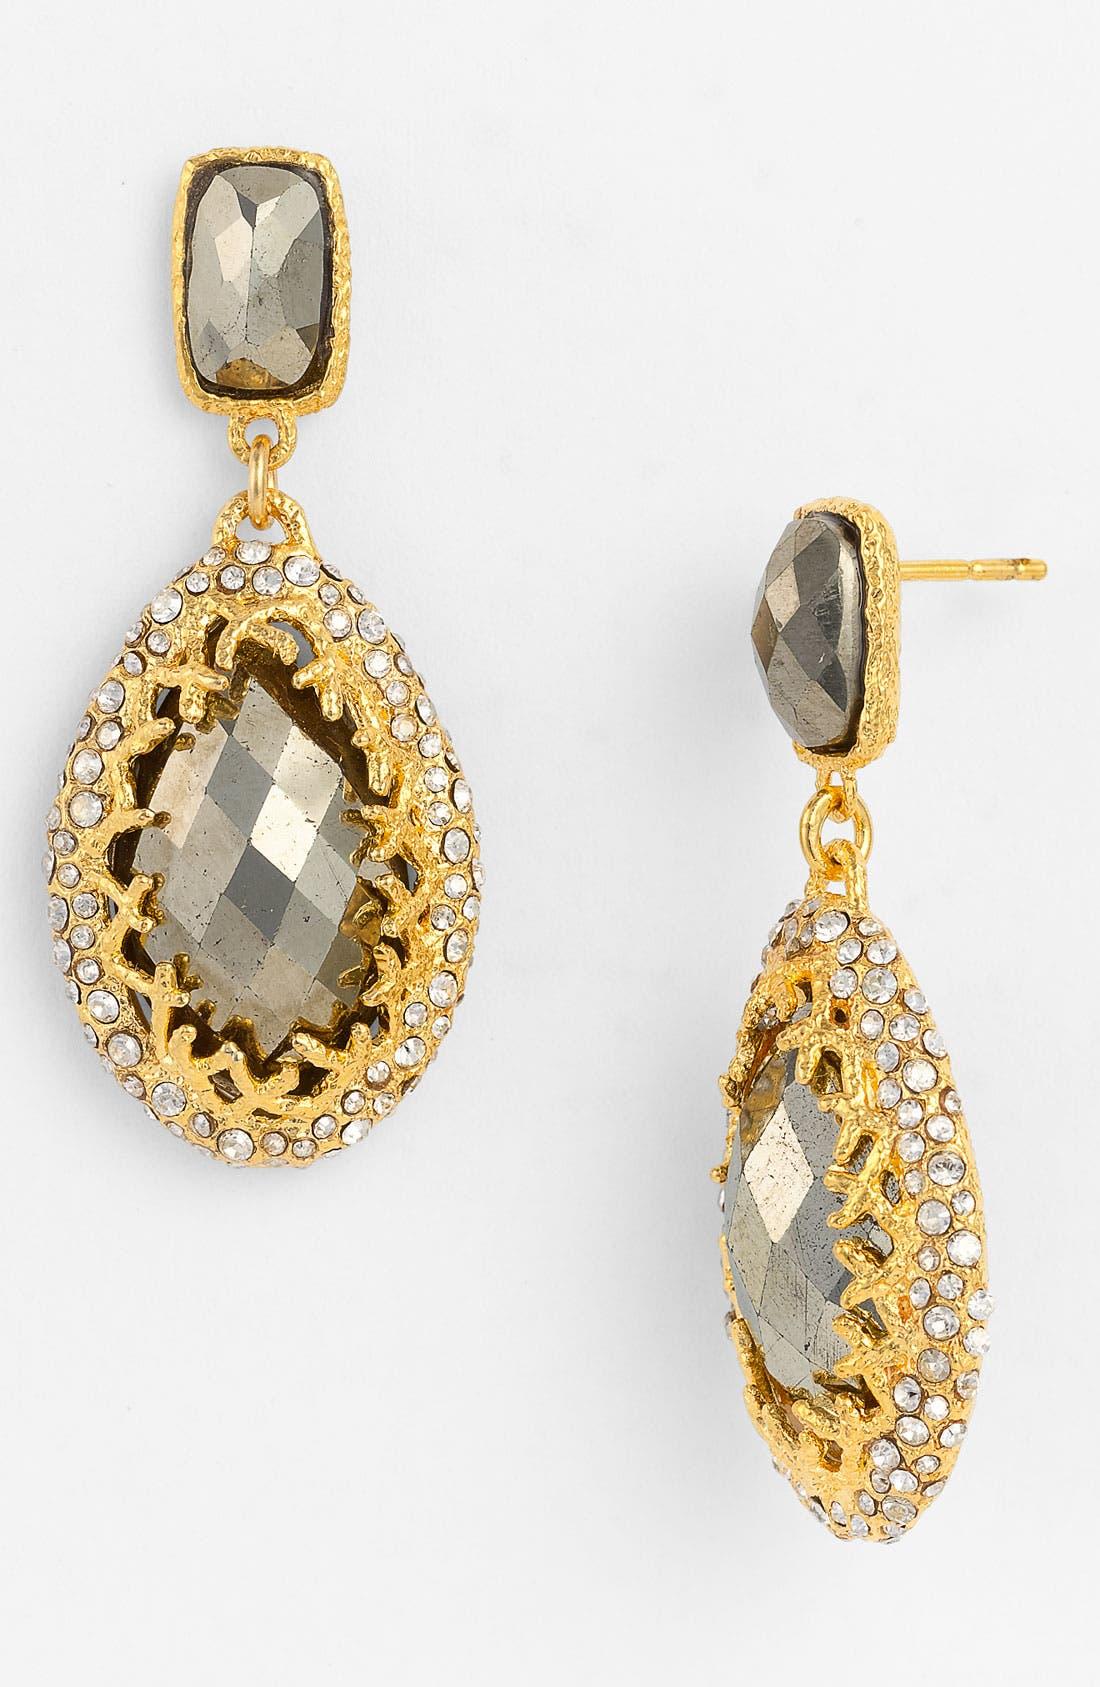 Alternate Image 1 Selected - Alexis Bittar 'Elements' Crown Set Drop Earrings (Nordstrom Exclusive)